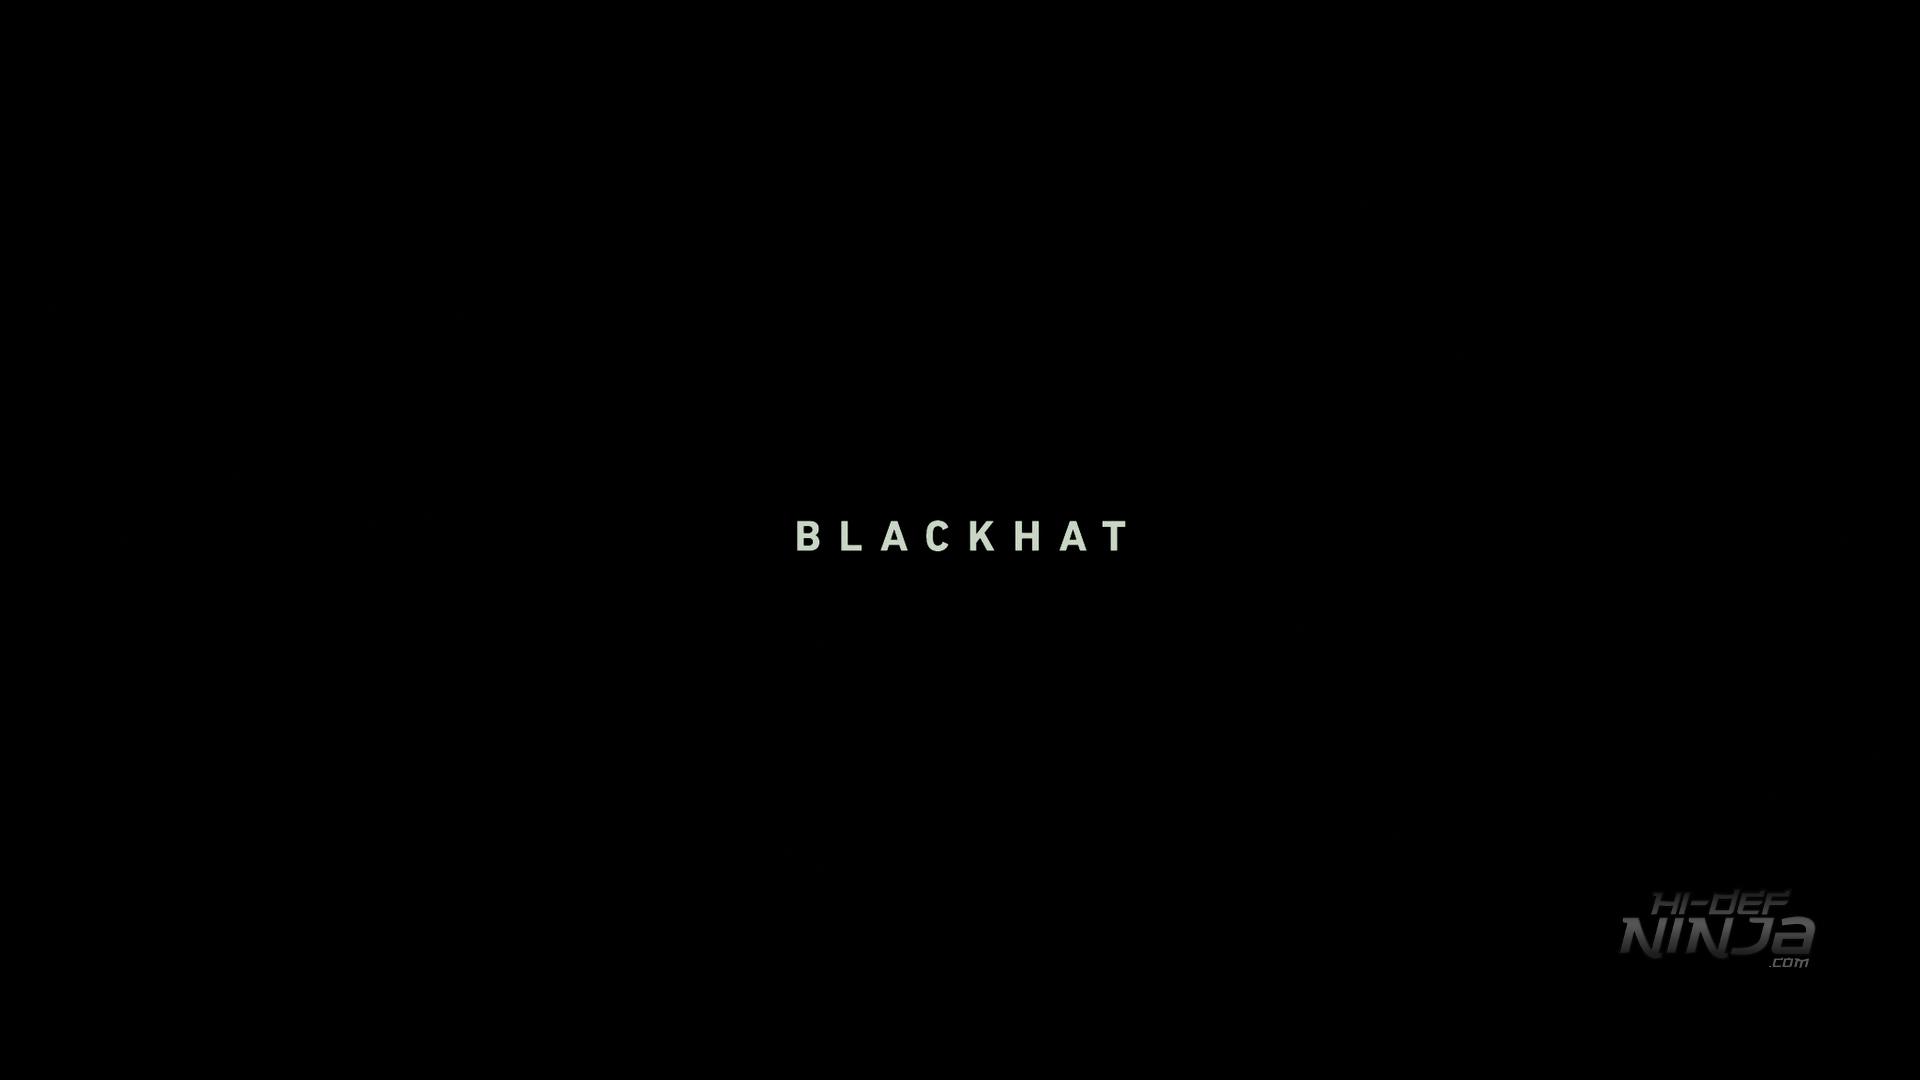 Blackhat-HiDefNinja (1)